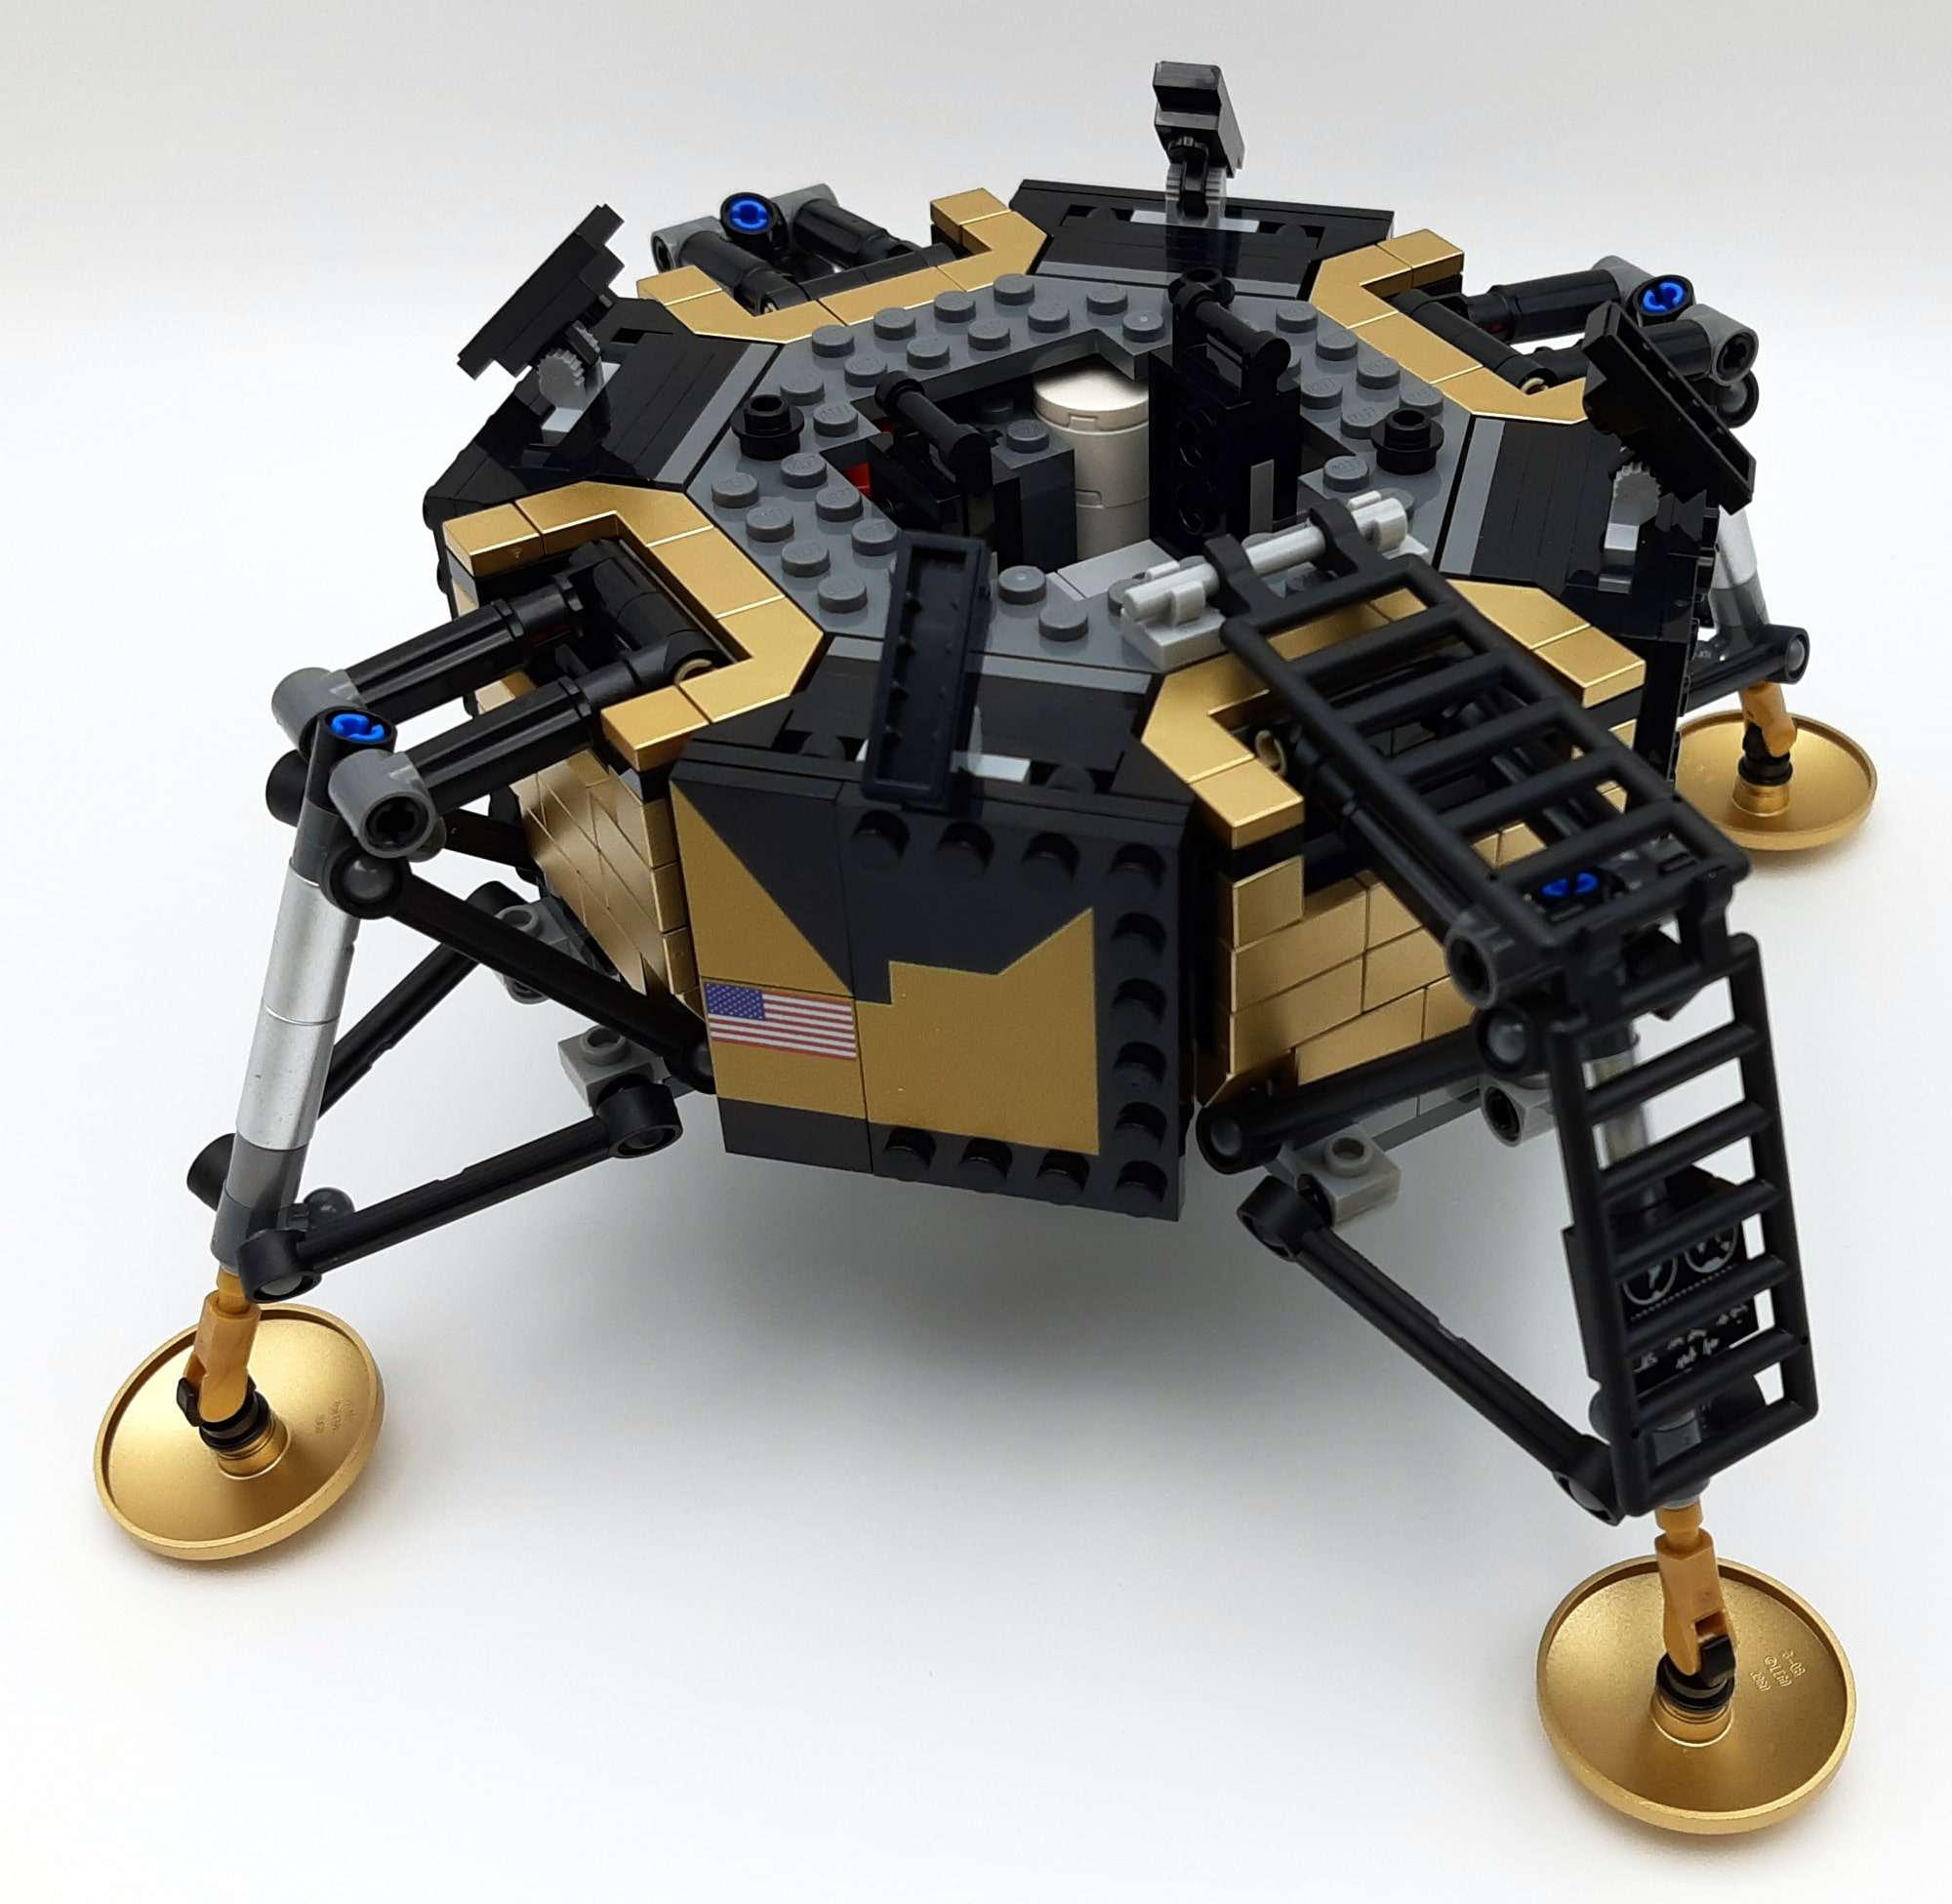 LEGO 10266 Nasa Apollo 11 Mondlandefähre - Bauabschnitt 3 2